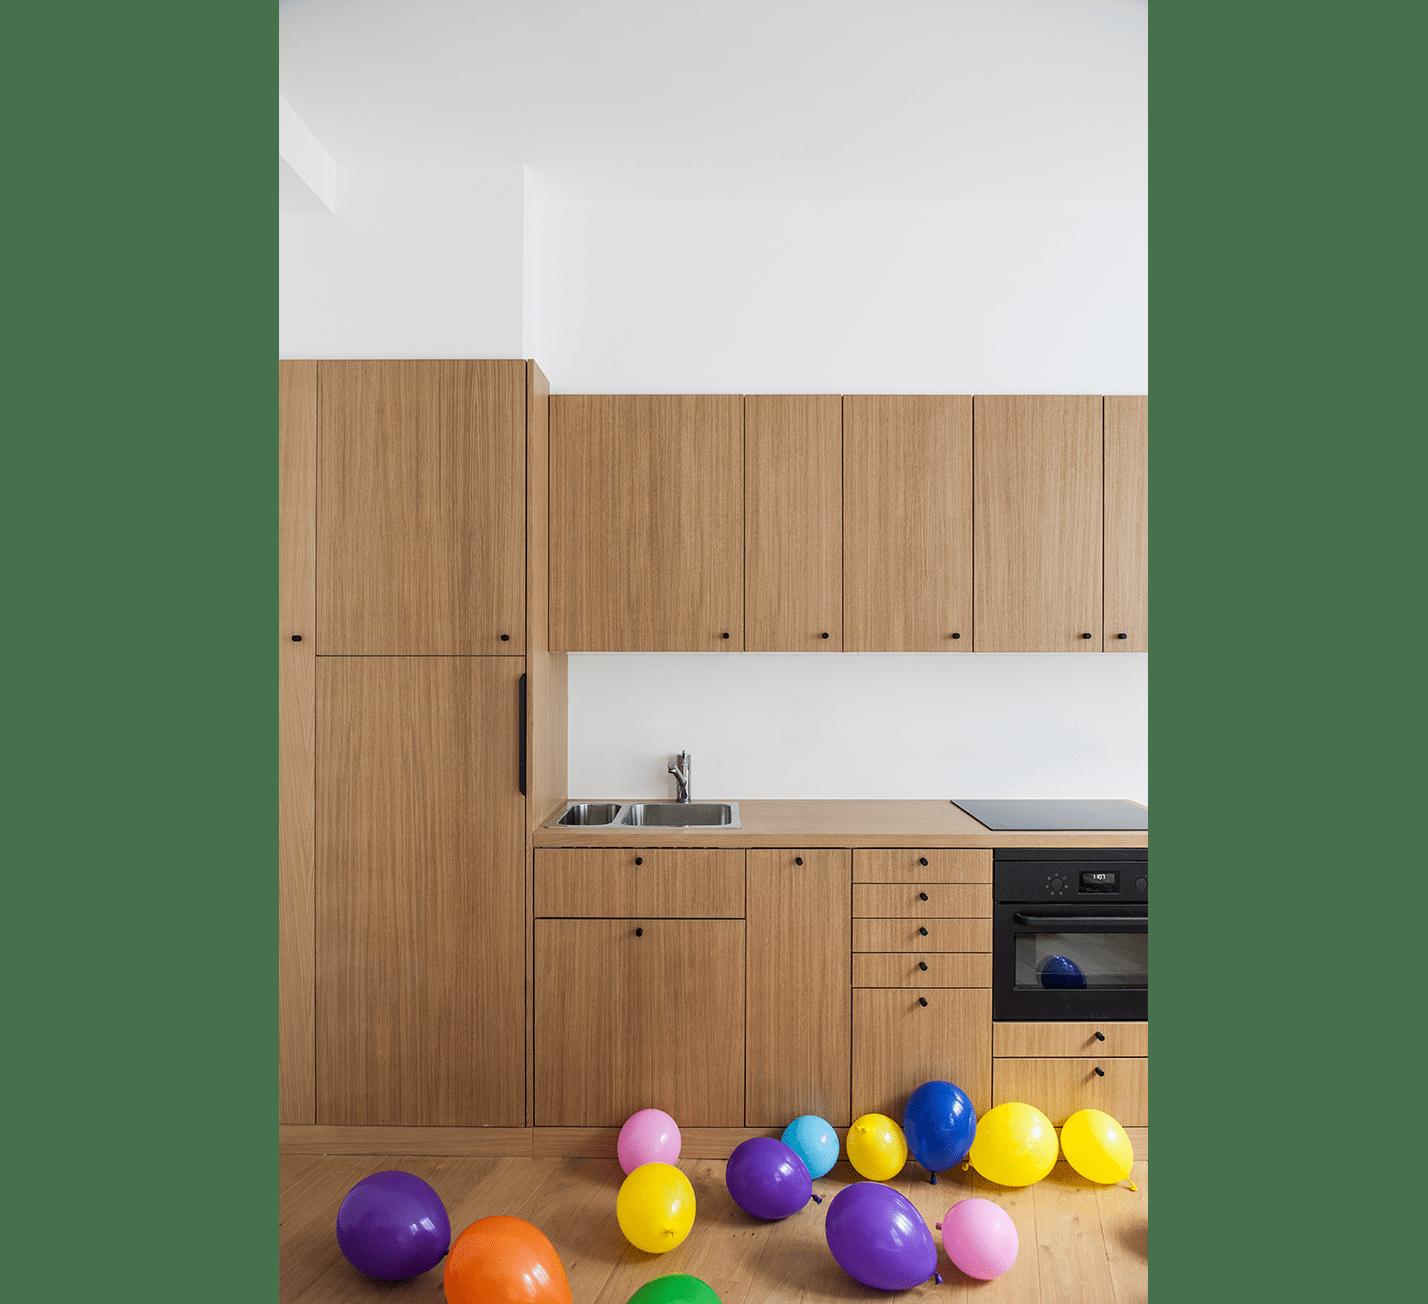 Projet-Arlequin-Atelier-Steve-Pauline-Borgia-Architecture-interieur-11-min